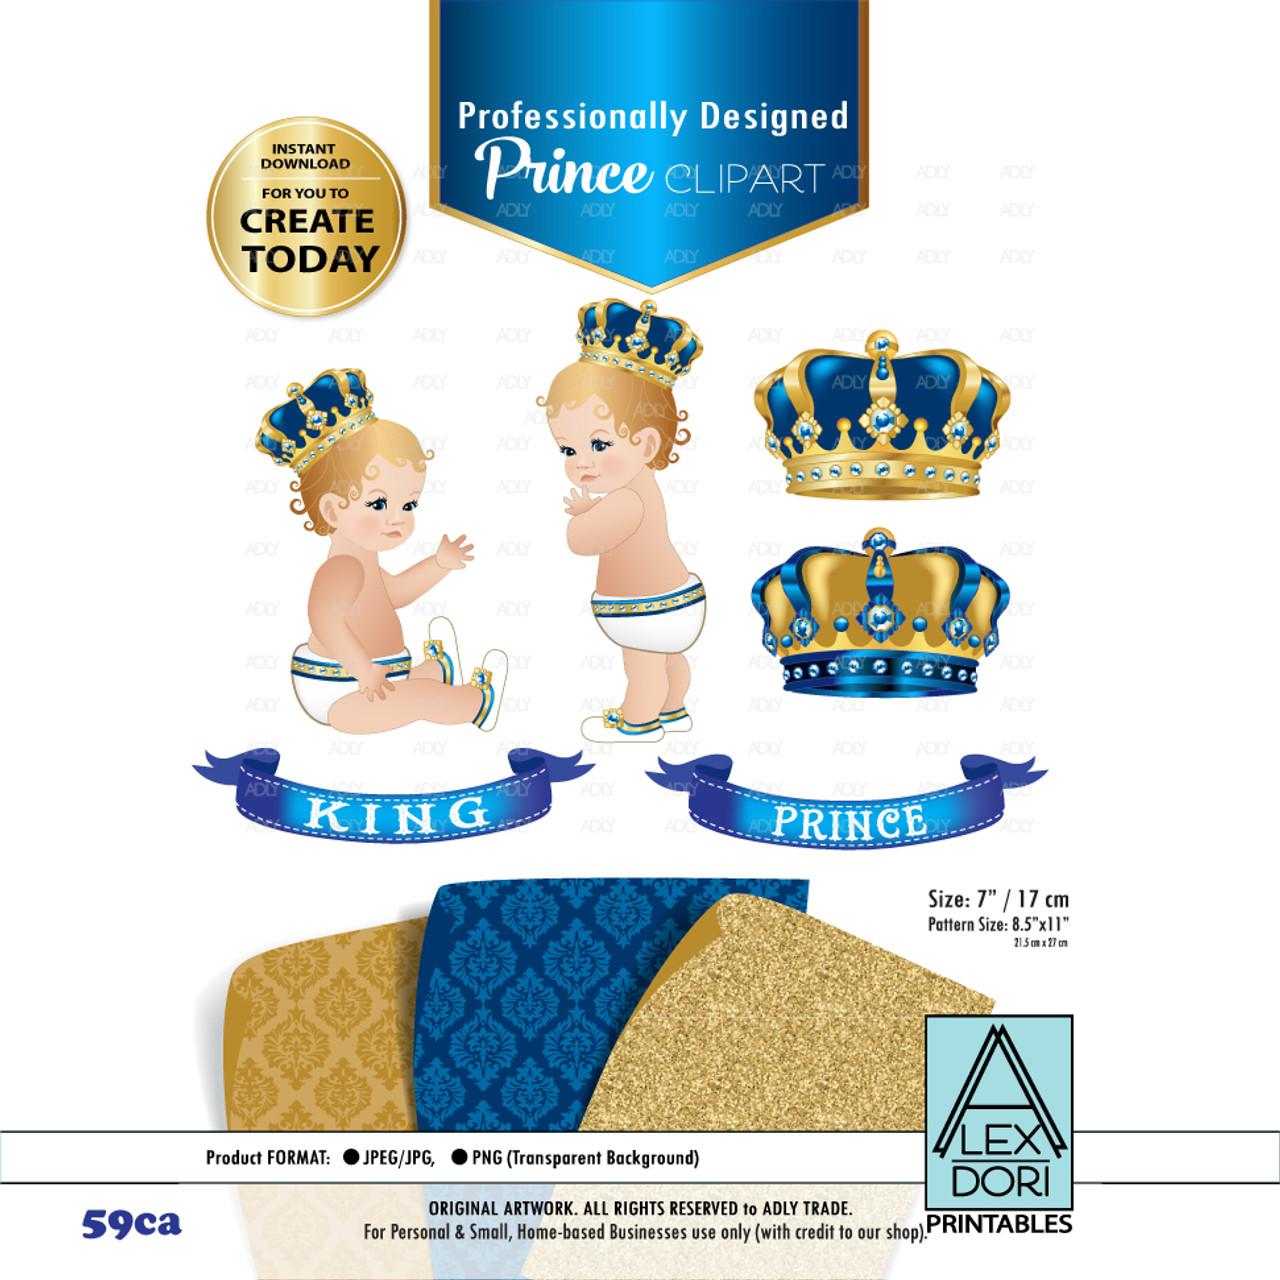 royal prince king royal digital clipart blue and gold baby clipart crown scrapbook clip art royal crowns royal baby shower